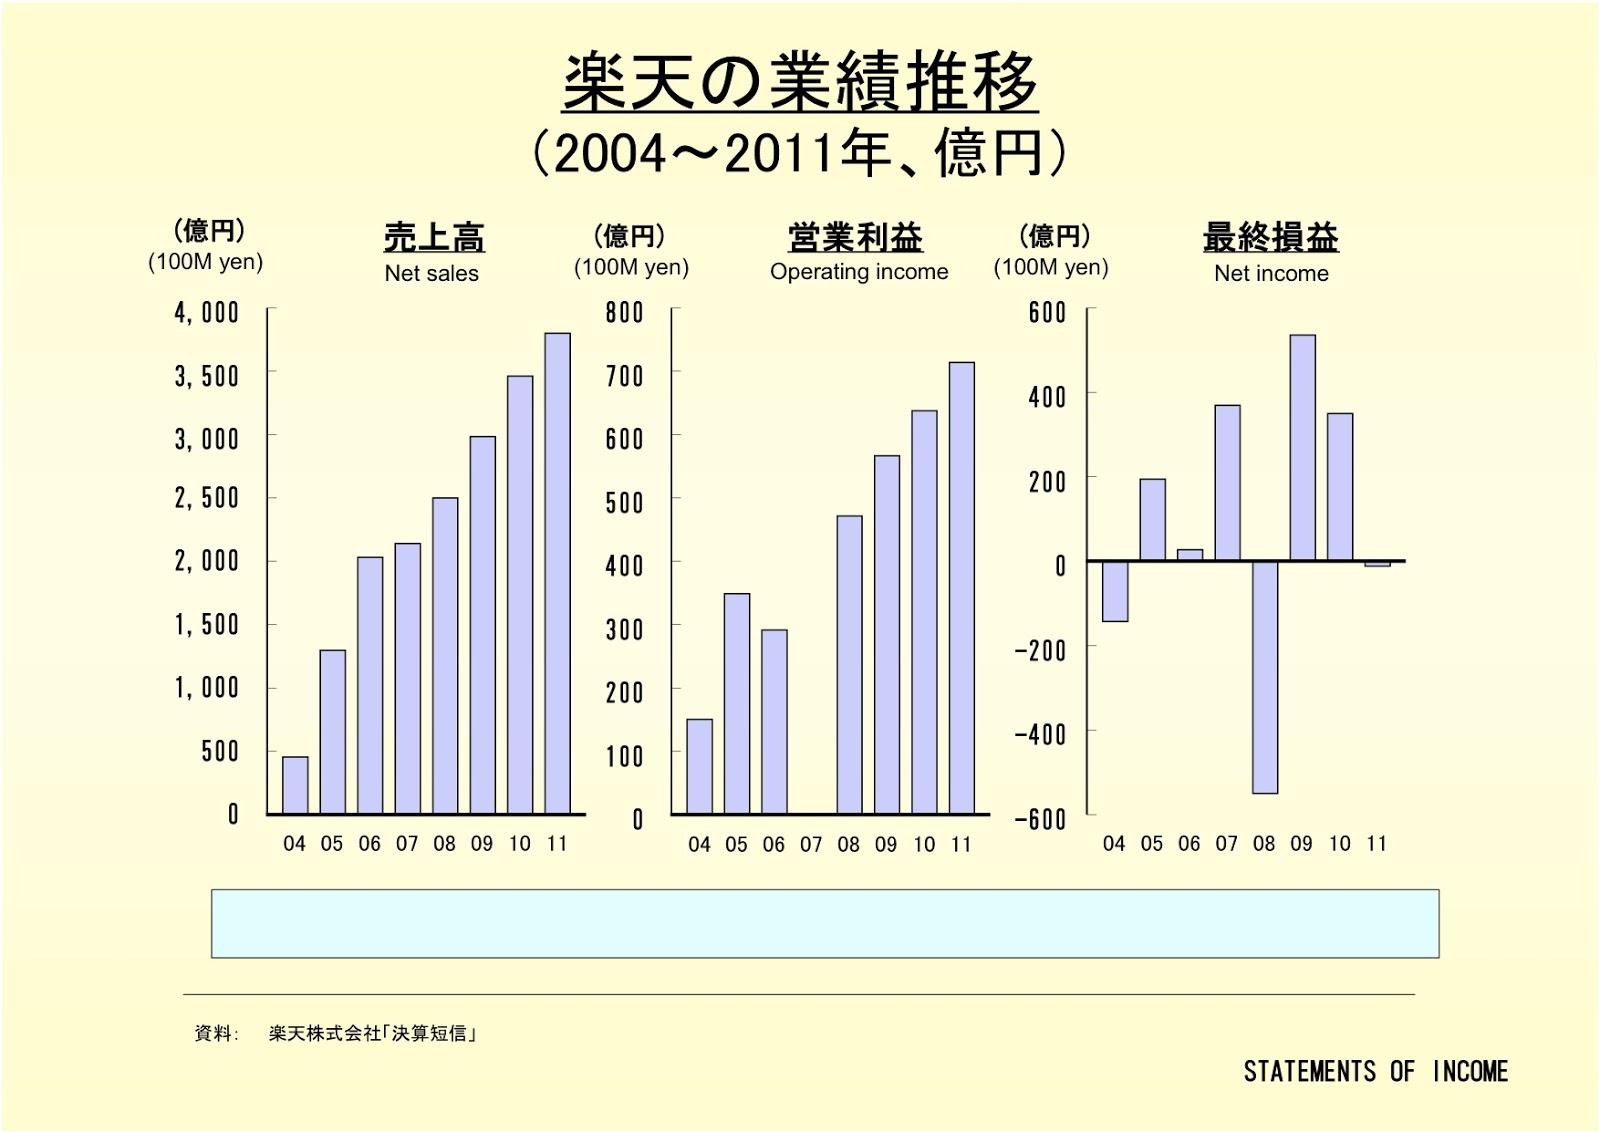 楽天株式会社の業績推移